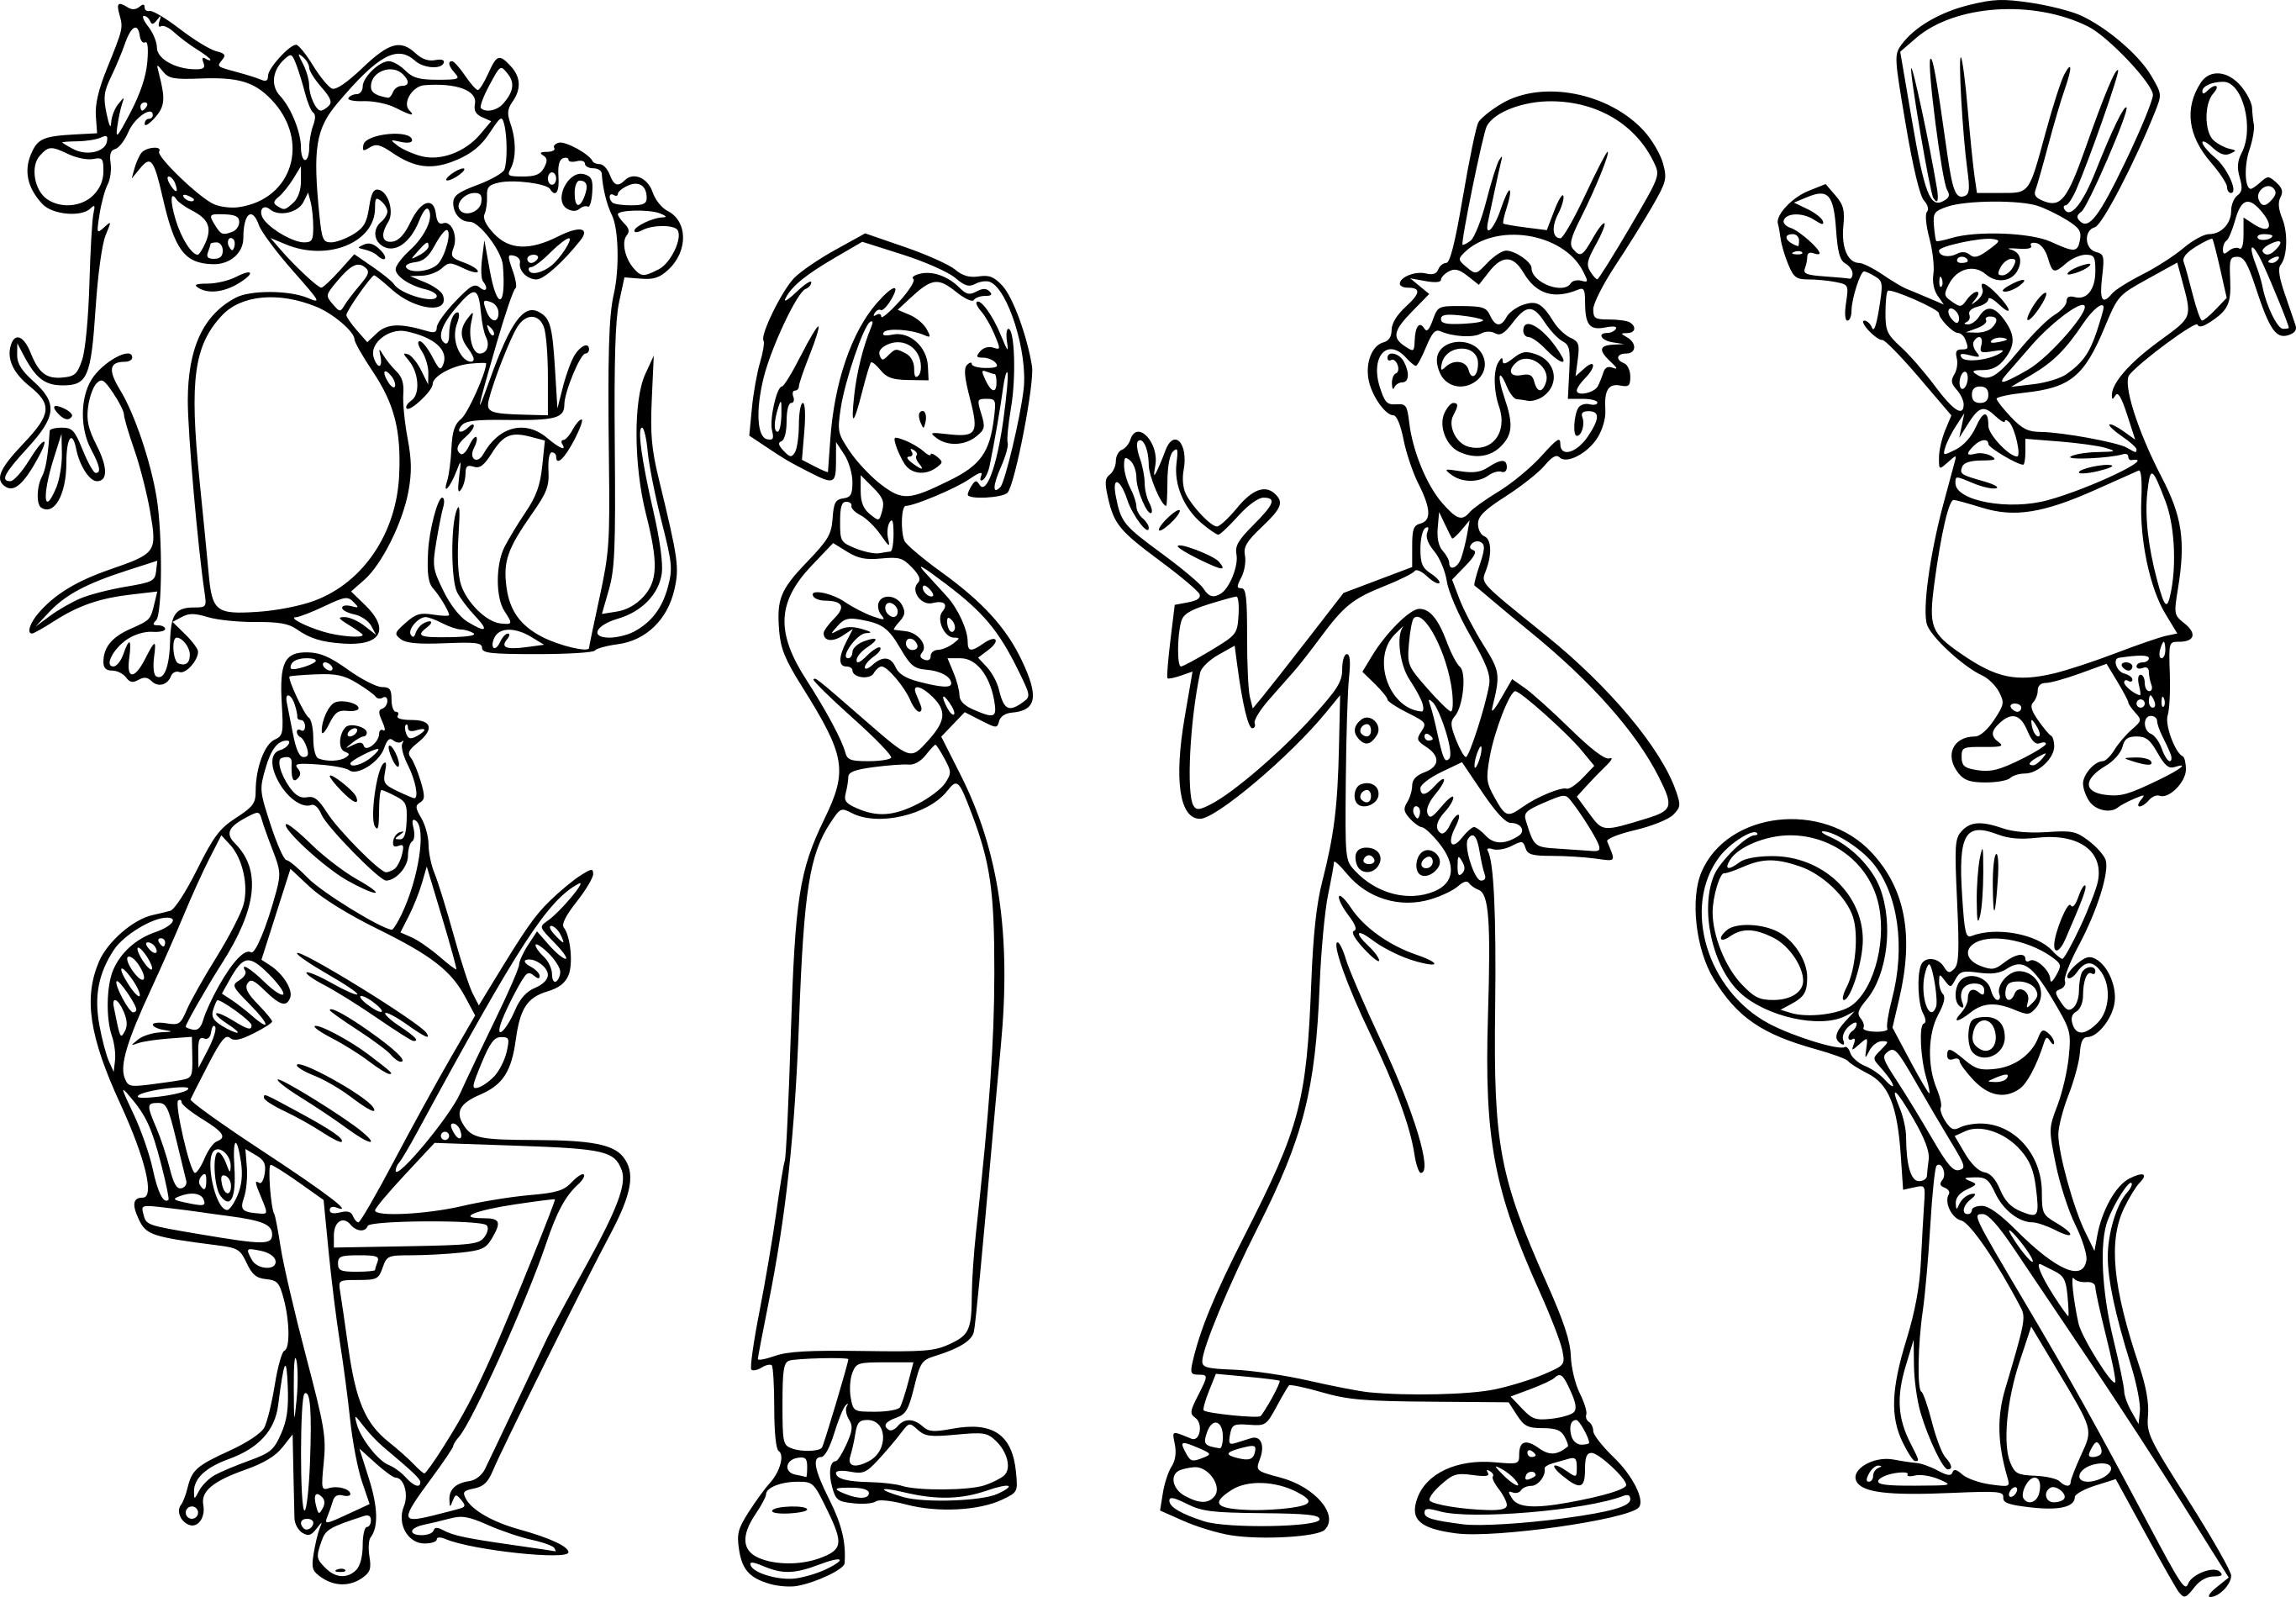 Coloriage Rauille Disney À Imprimer serapportantà Dessin A Imprimer